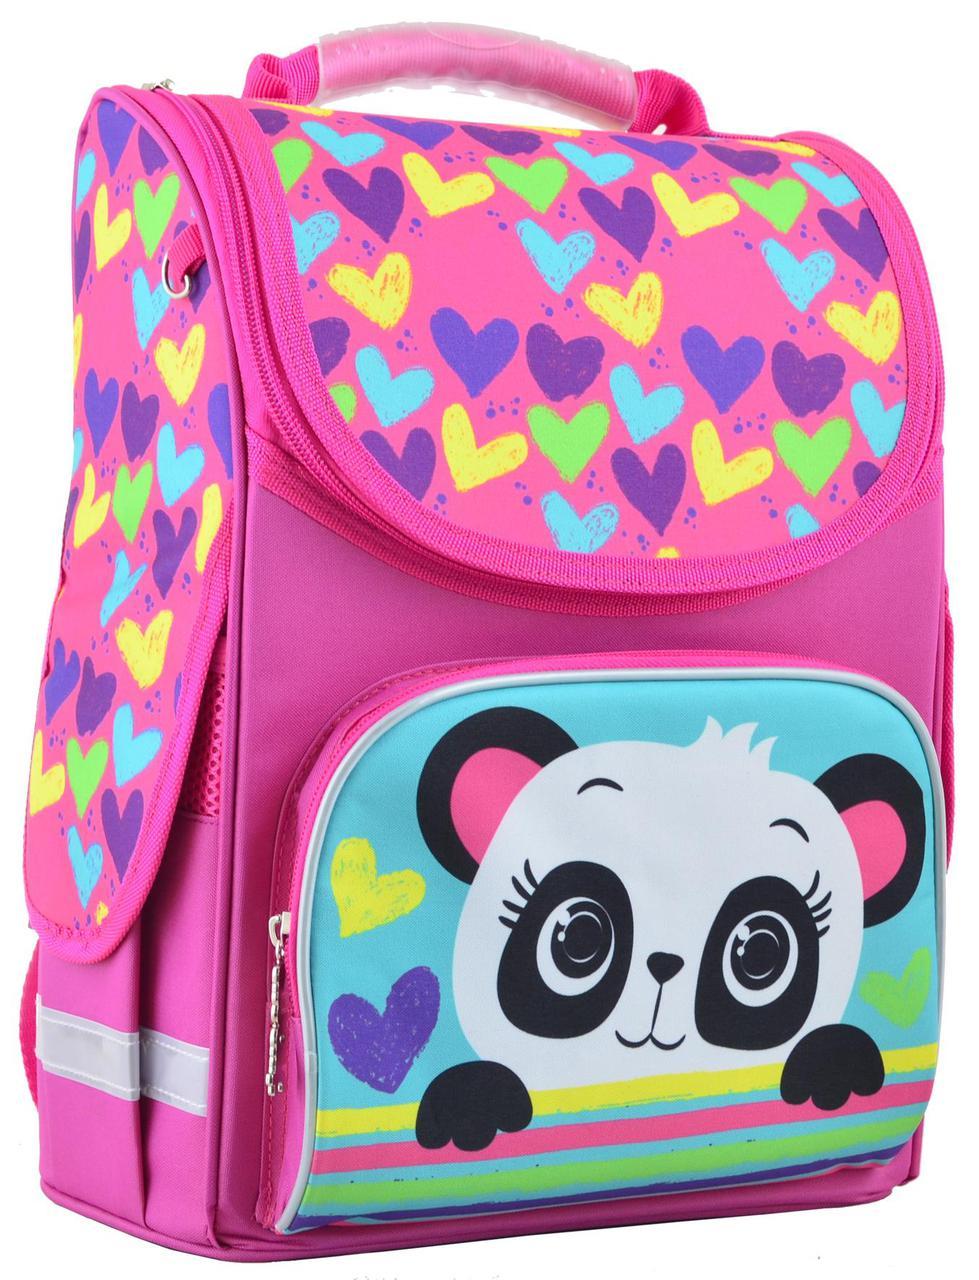 Рюкзак каркасный  PG-11 Panda, 34*26*14